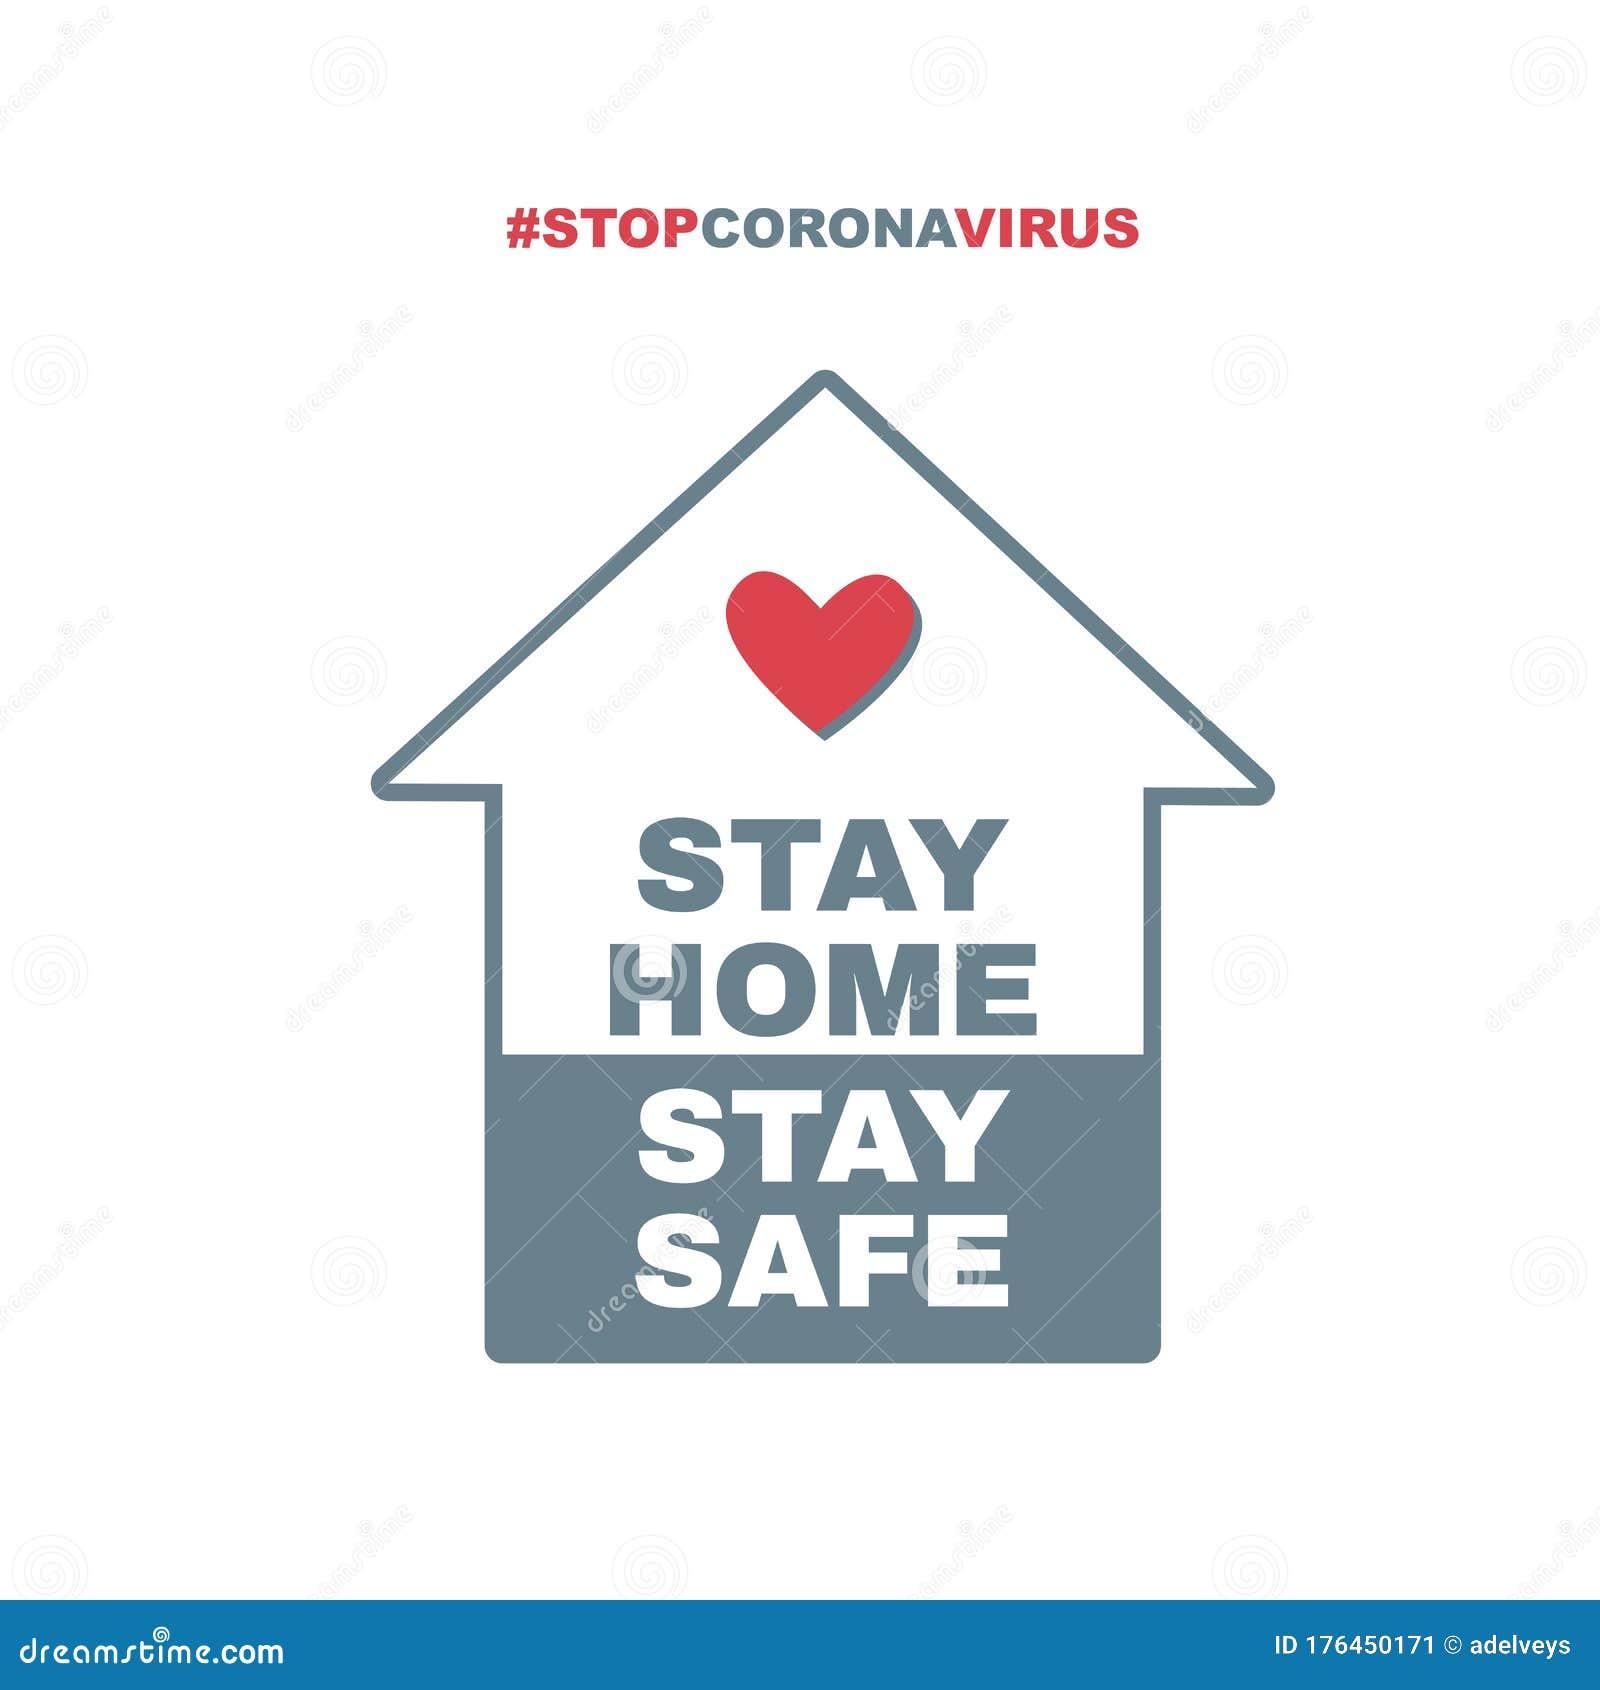 Stay Home, Stay Safe Hashtag. Stop Coronavirus. Quarantine Vector  Illustration Stock Vector - Illustration of virus, security: 176450171